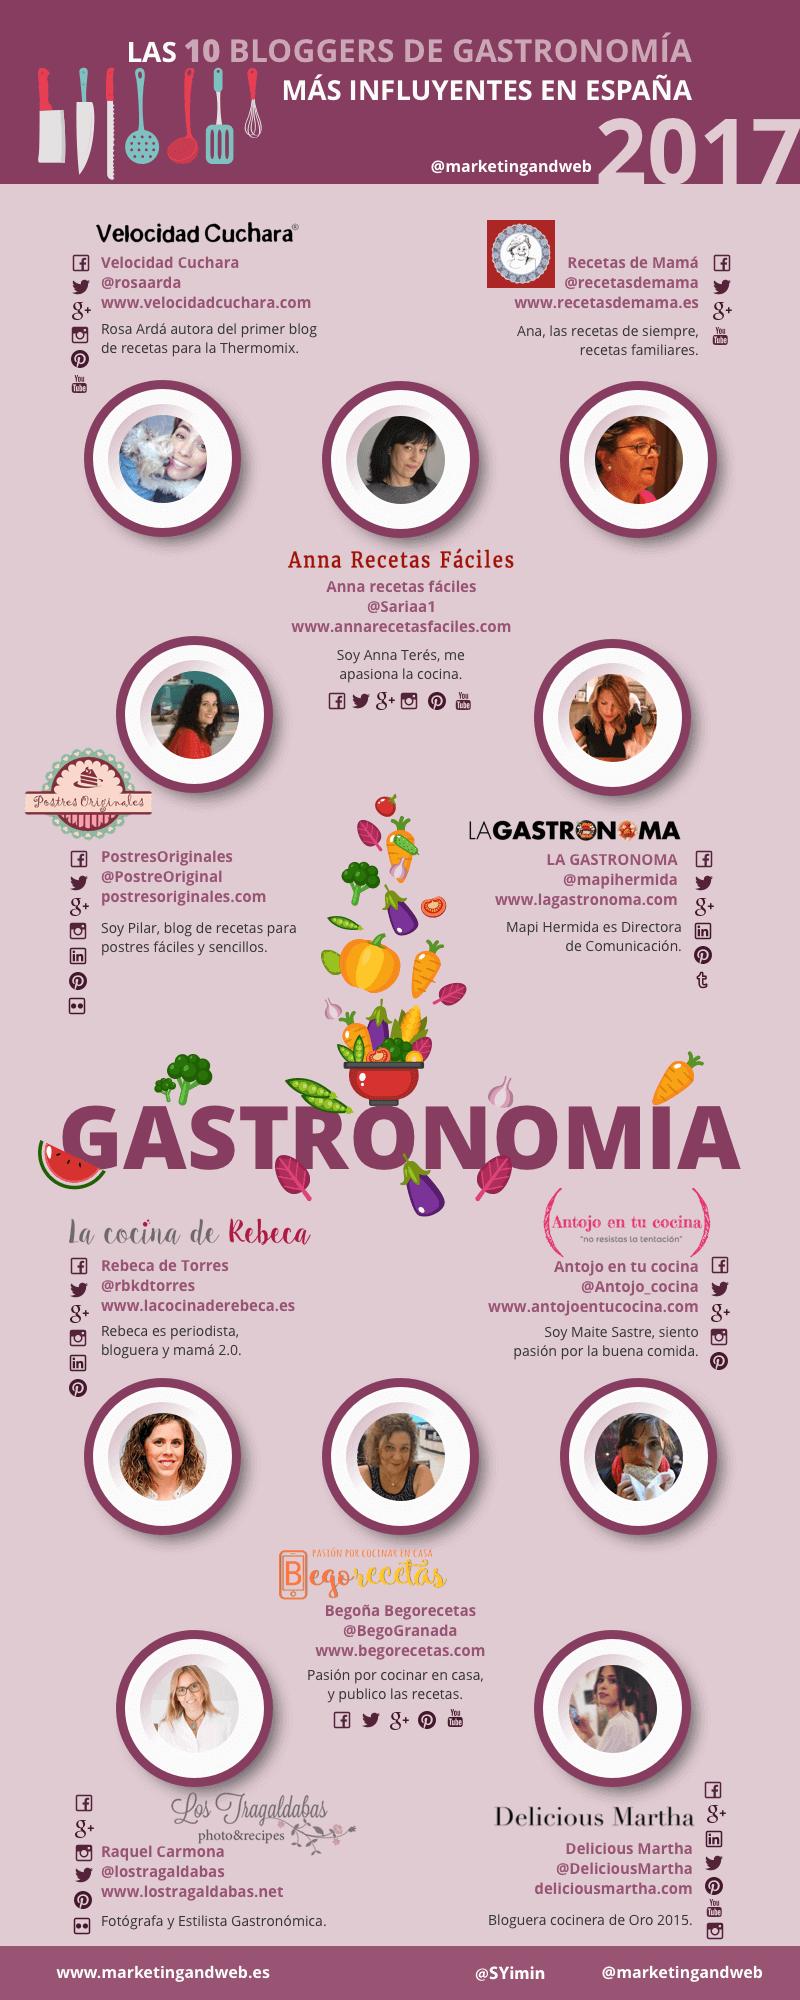 10 Bloggers de Gastronomía más influyentes en España